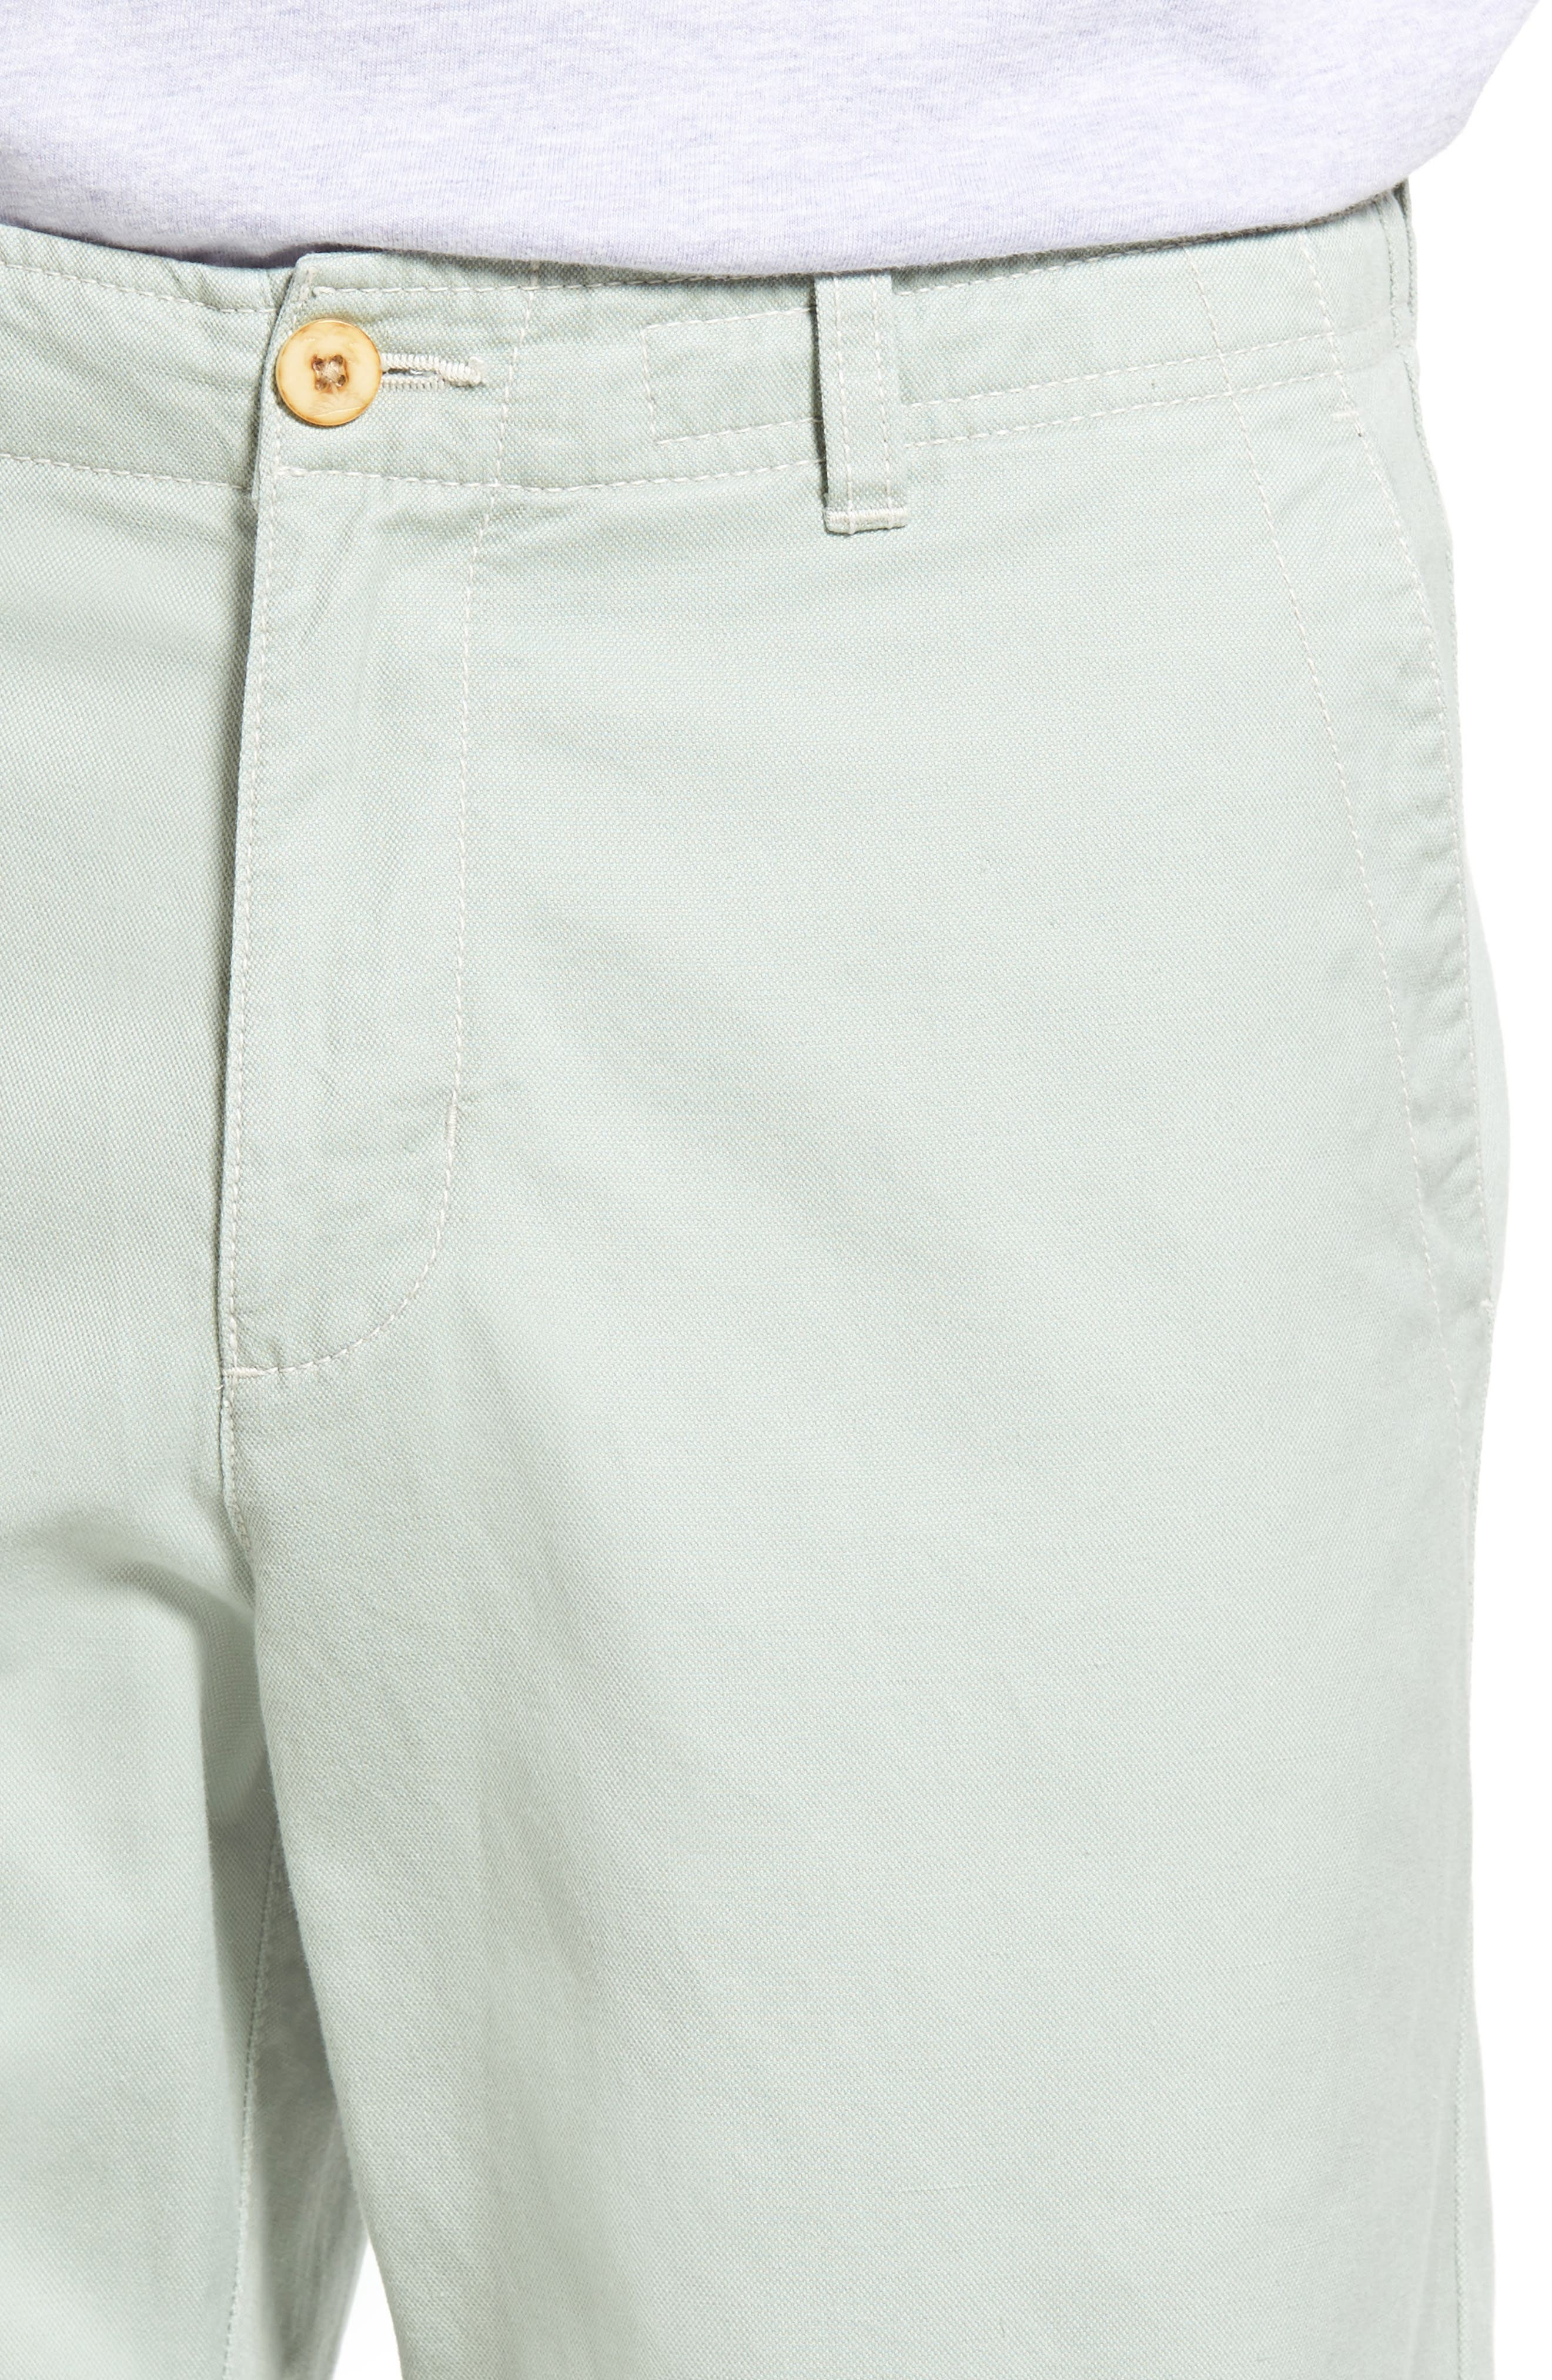 Aegean Lounger Shorts,                             Alternate thumbnail 4, color,                             Iceberg Green